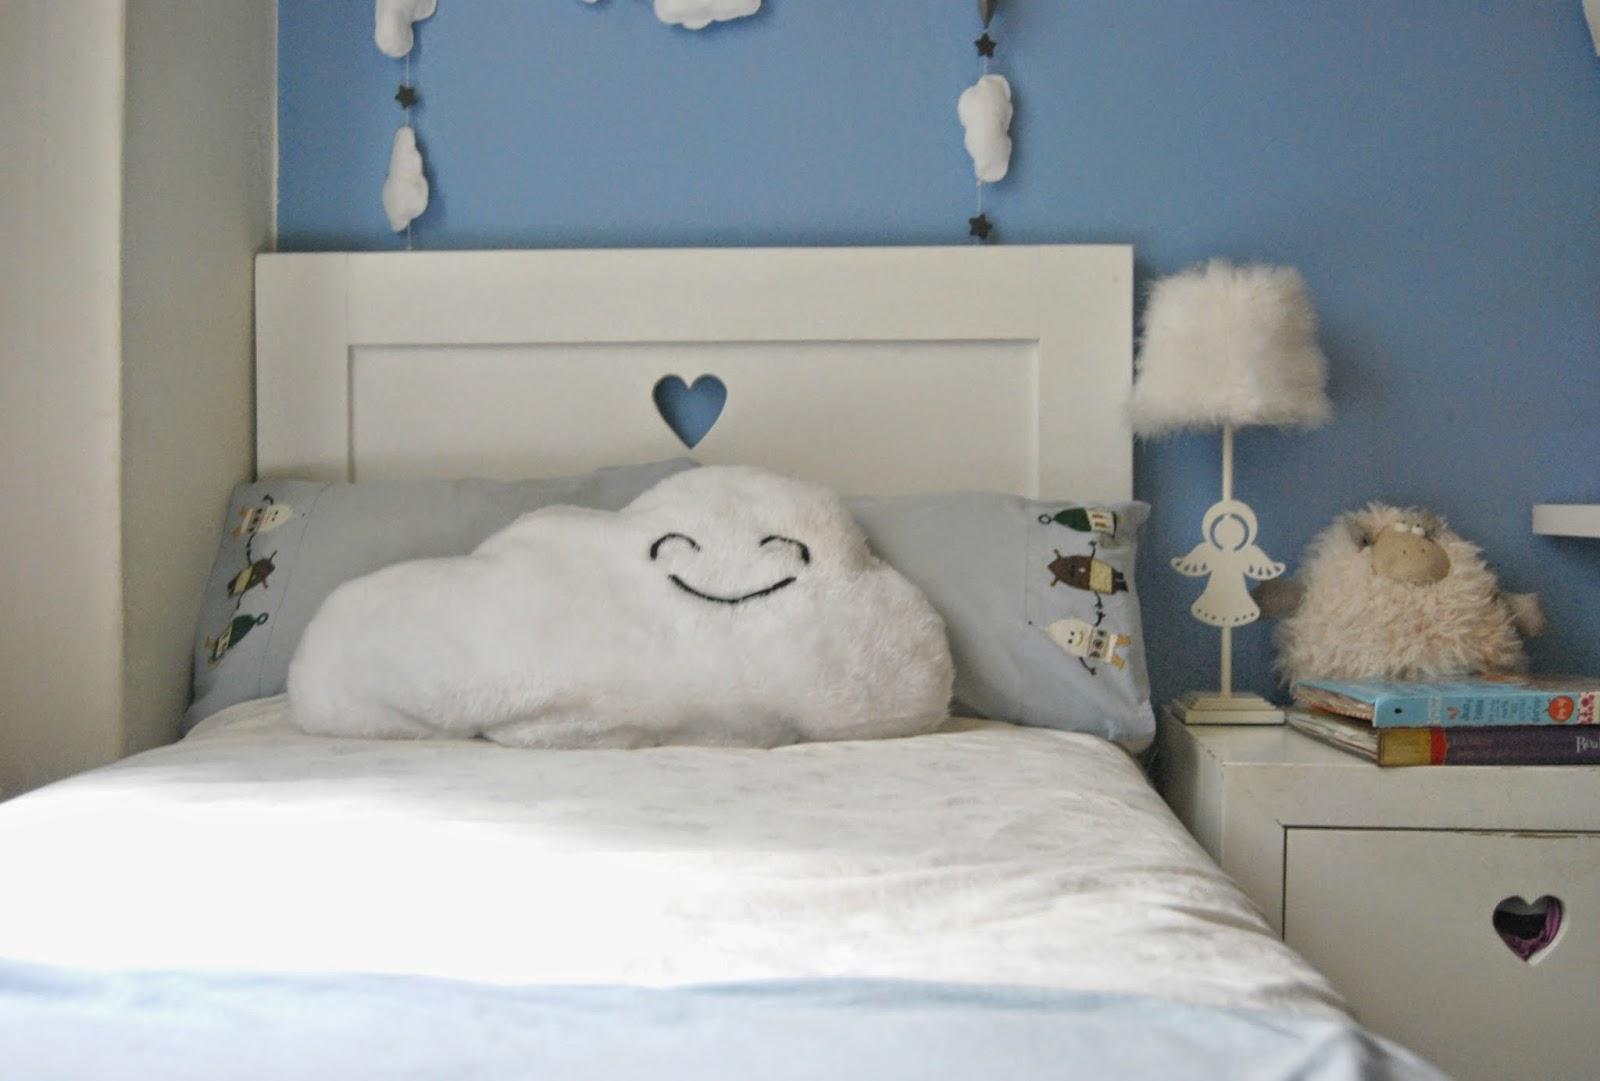 http://sosunnyblog.blogspot.com/2014/06/seguimos-con-la-cabeza-en-las-nubes.html